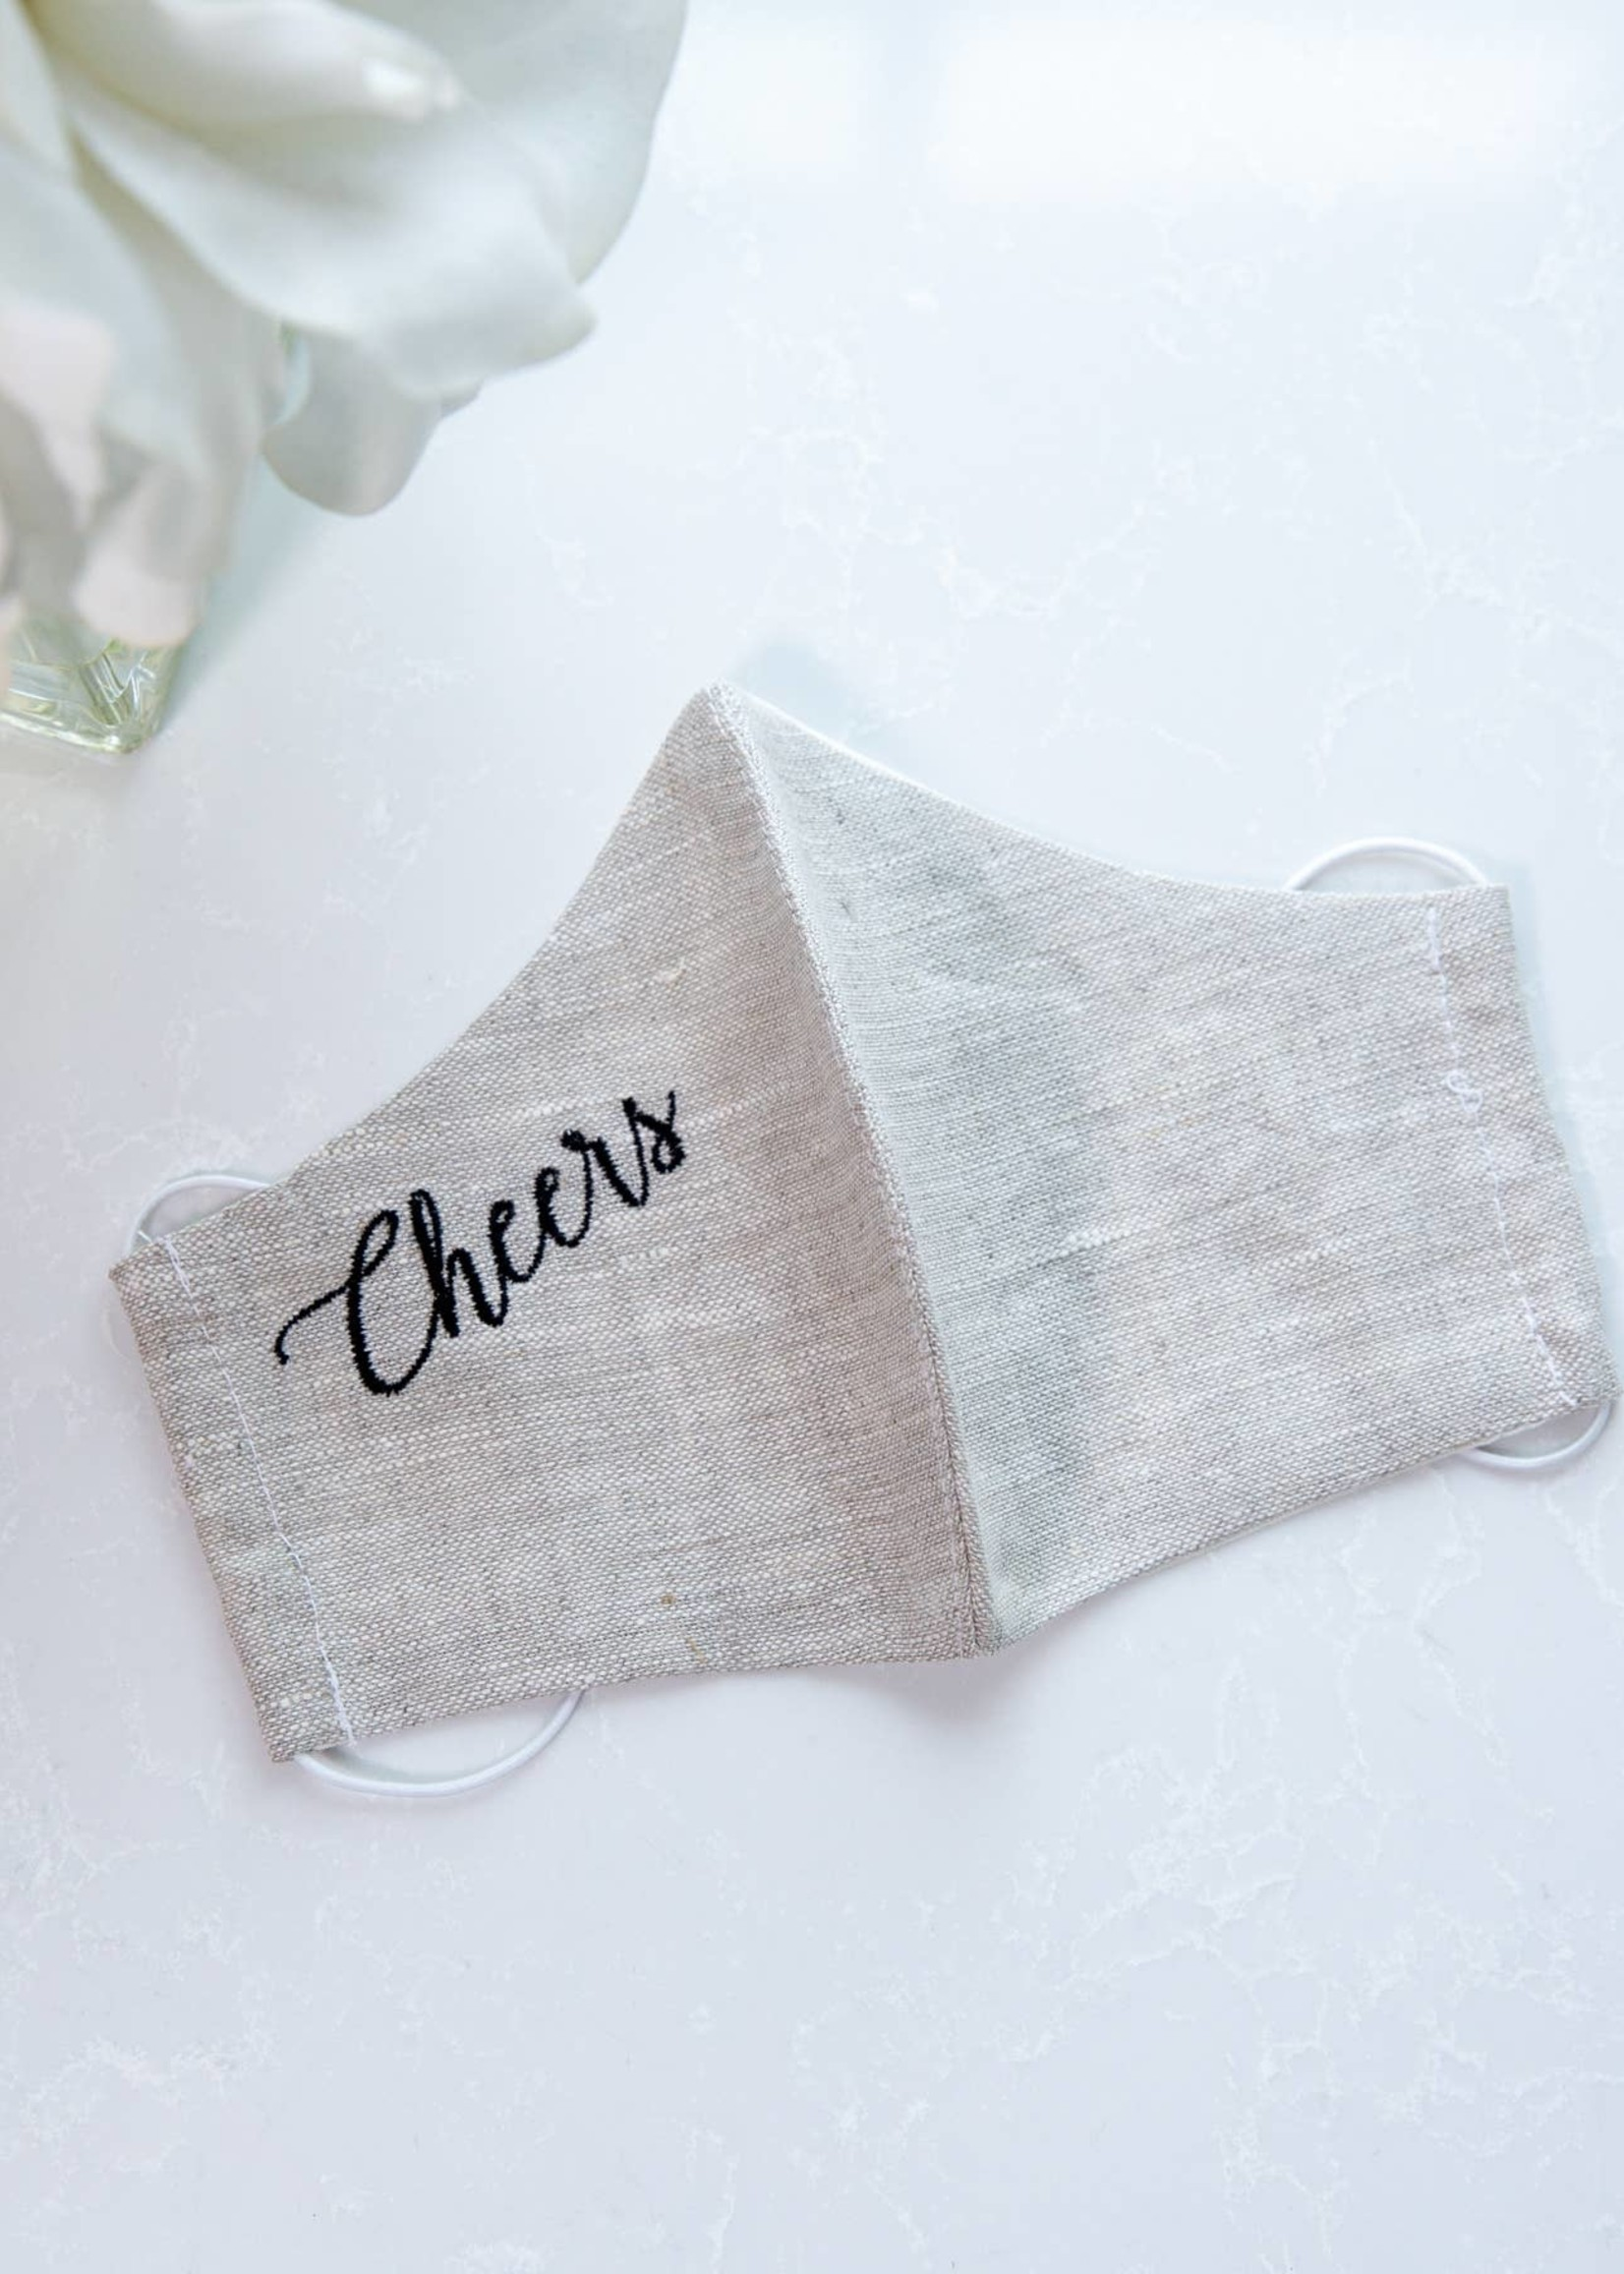 Crown Linen Designs Cheers Linen Face Mask